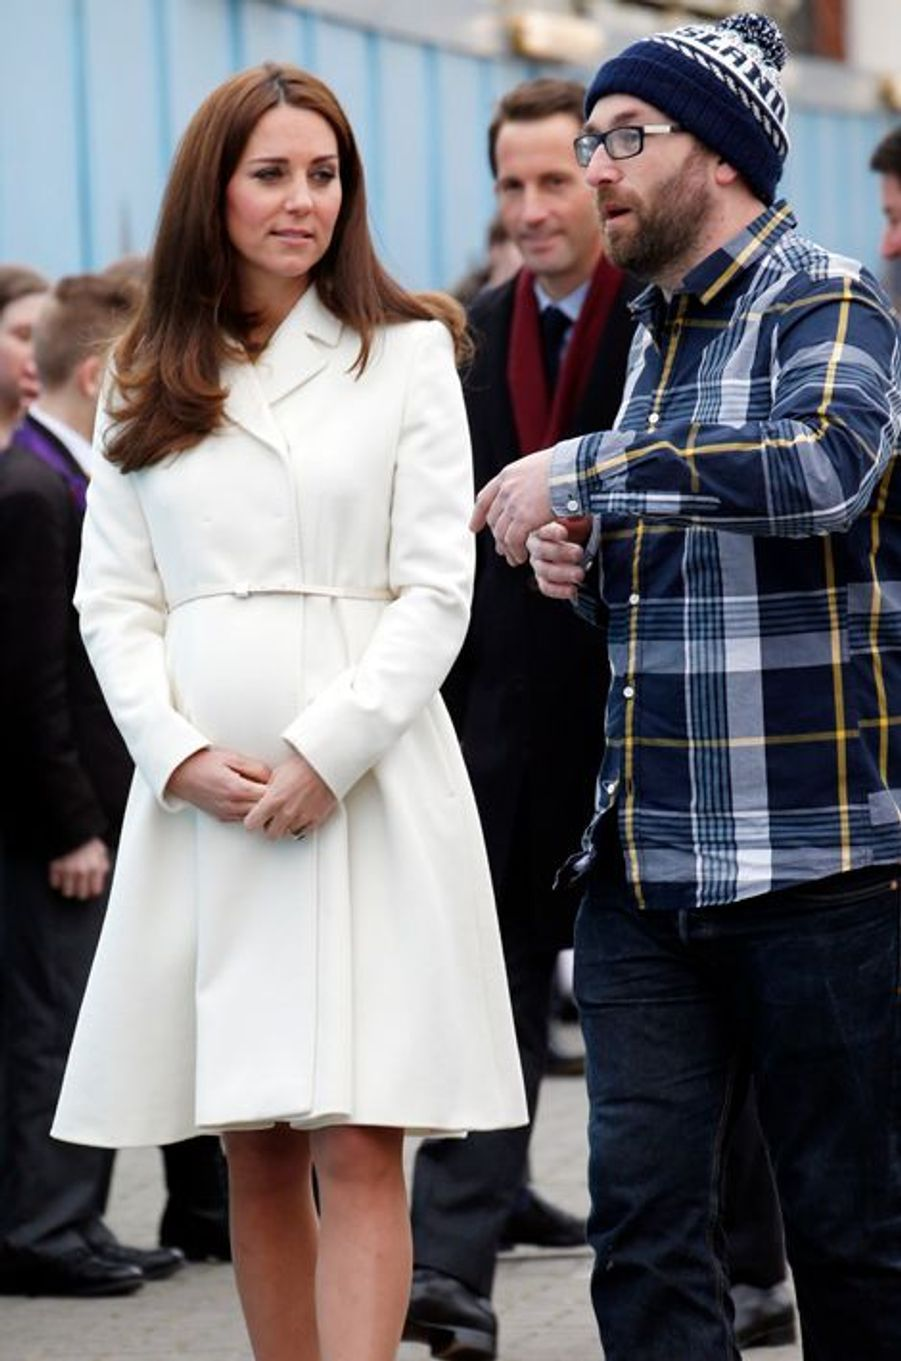 Kate ex-Middleton avec l'artiste urbain My Dog Sigh à Portsmouth, le 12 février 2015